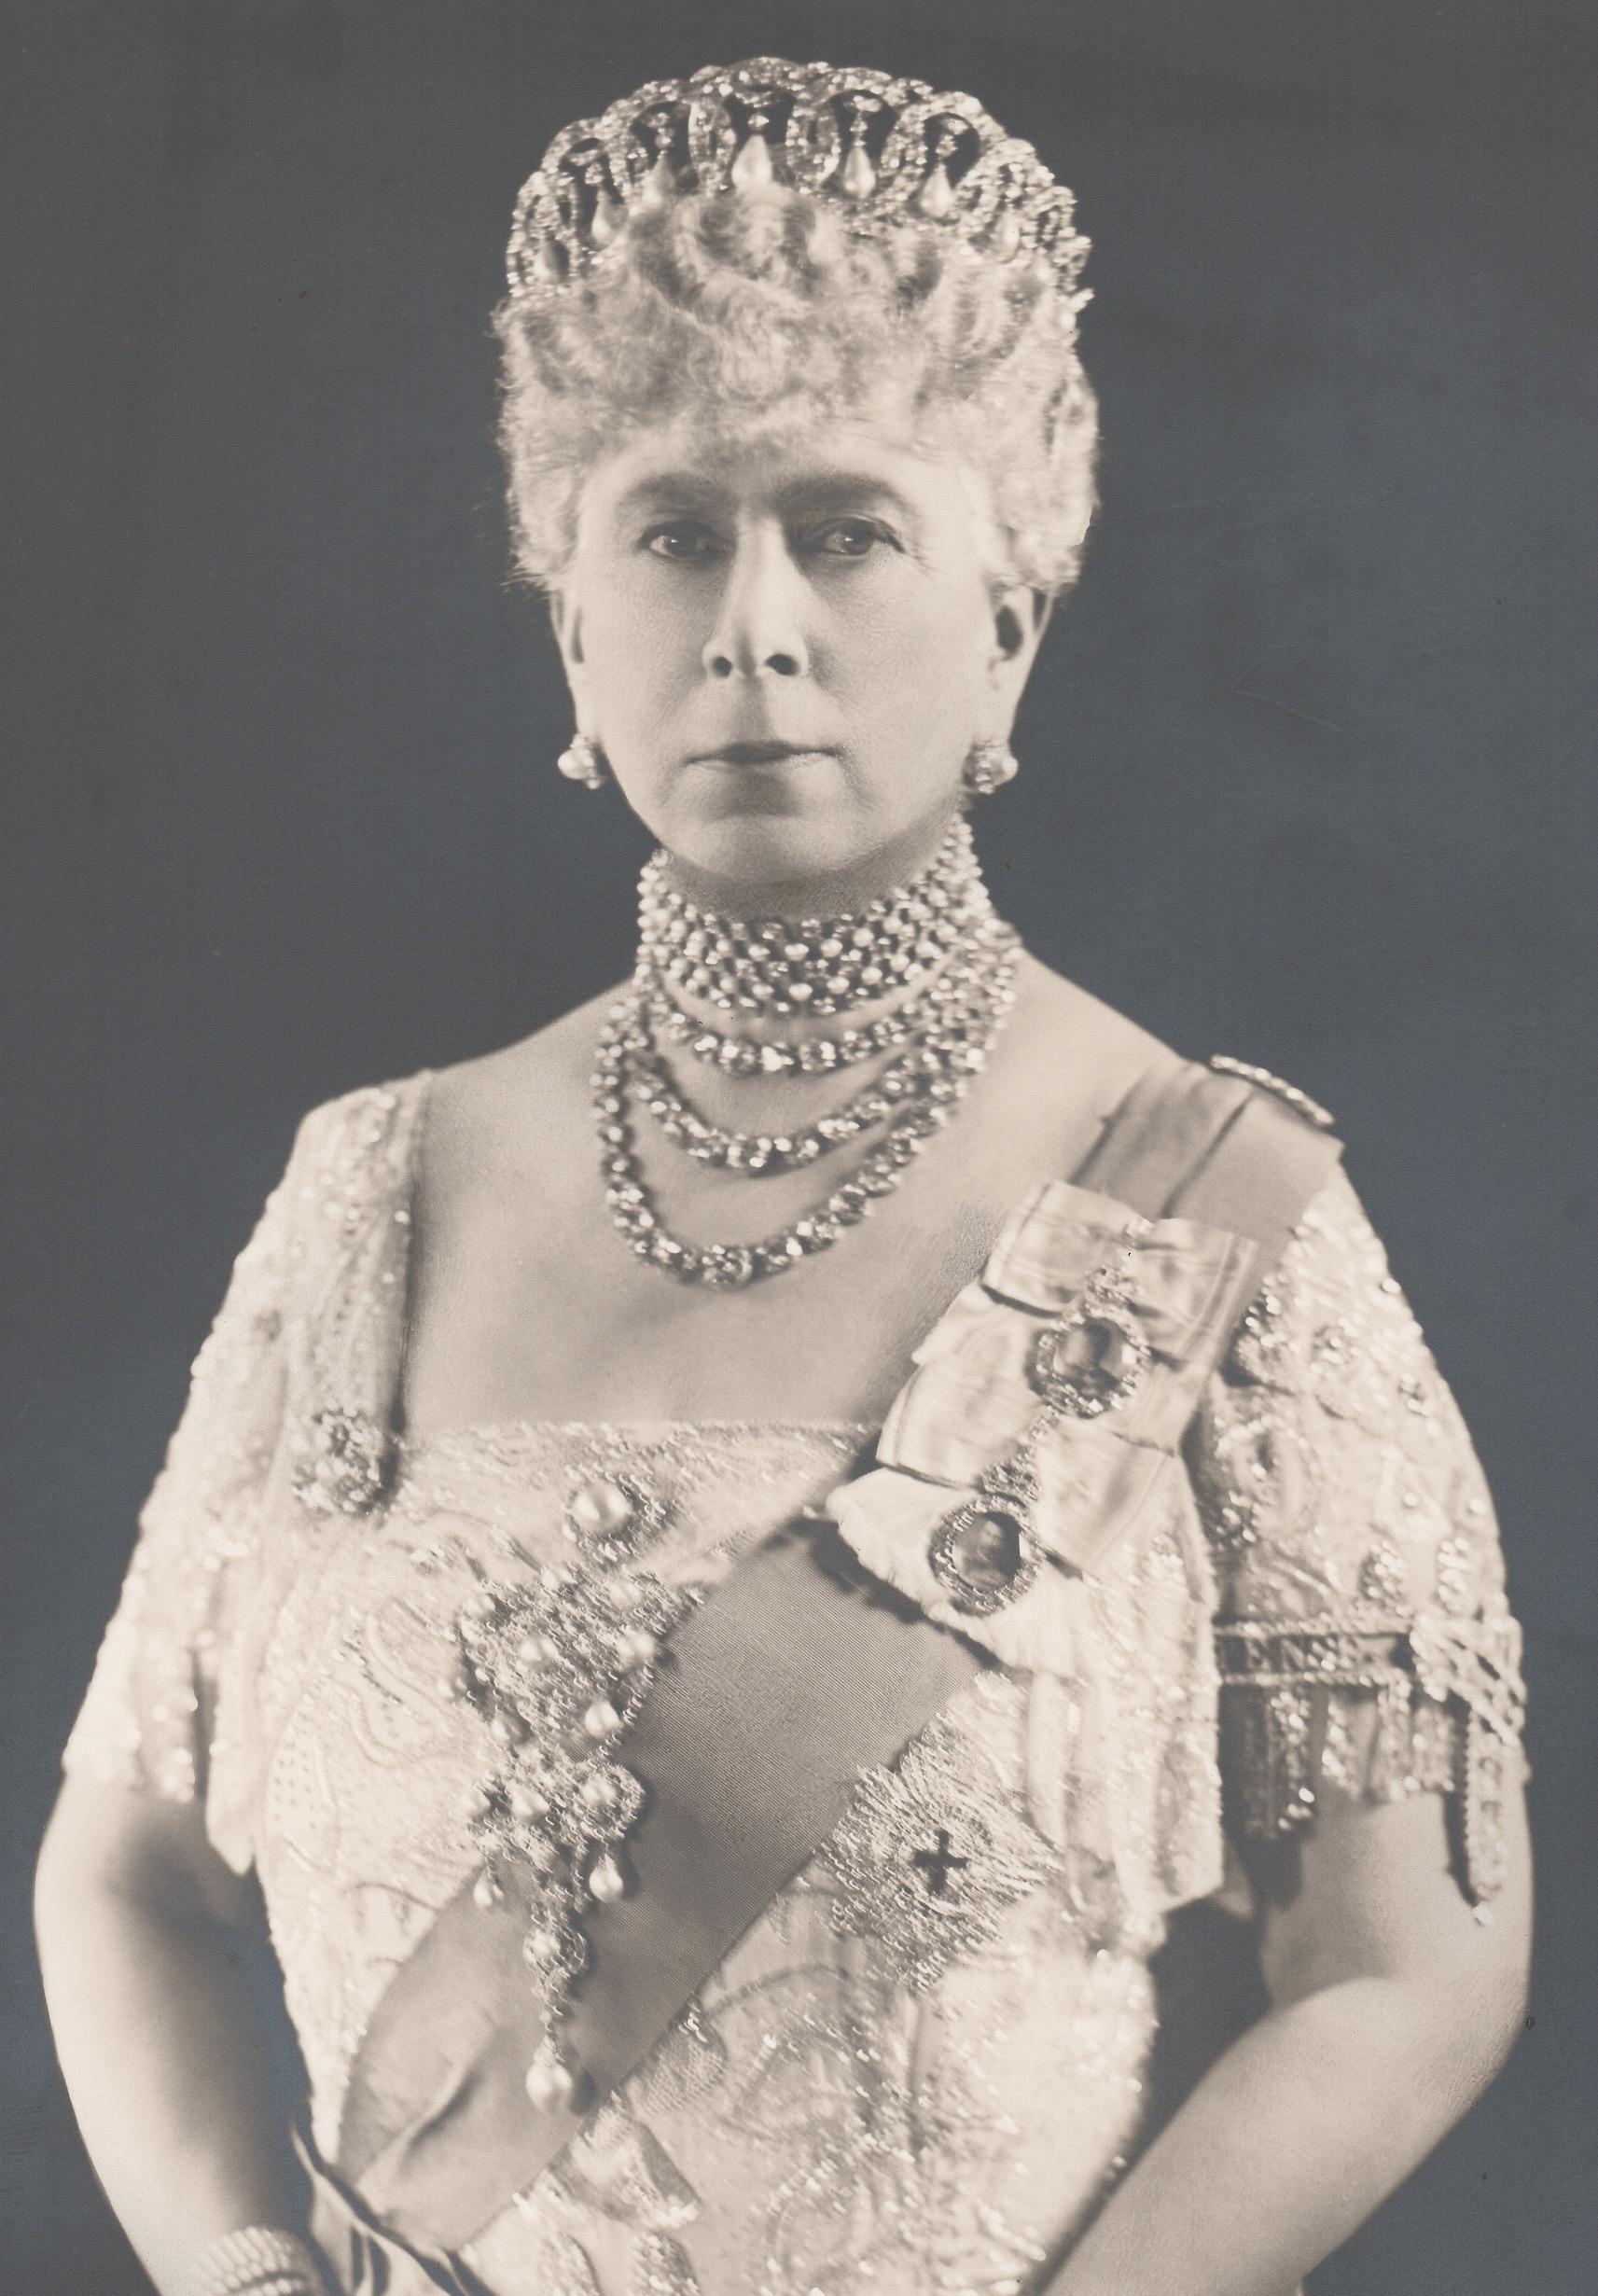 Royalty Queen Mary Original Signed Soper Studio Photograph. Queen Mary In Vladimir Tiara. - Image 3 of 4